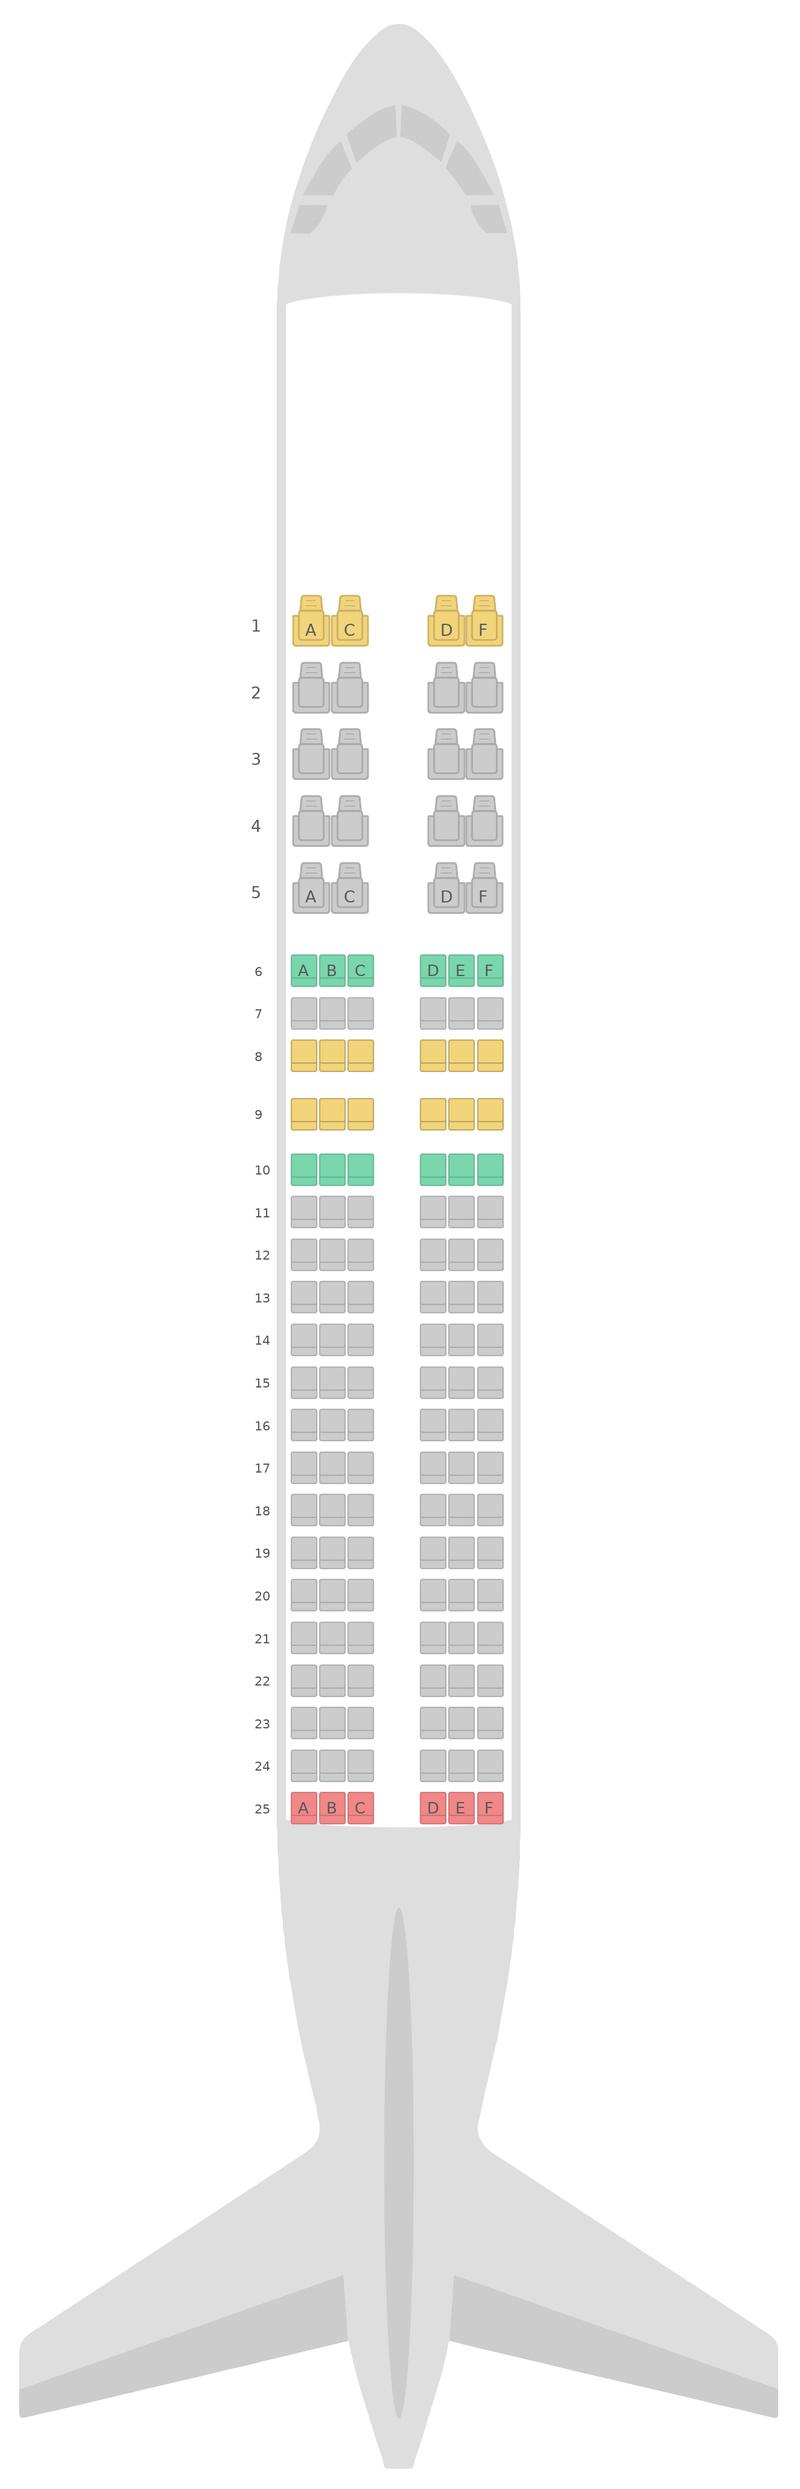 Sitzplan Airbus A320 v1 Aeroflot